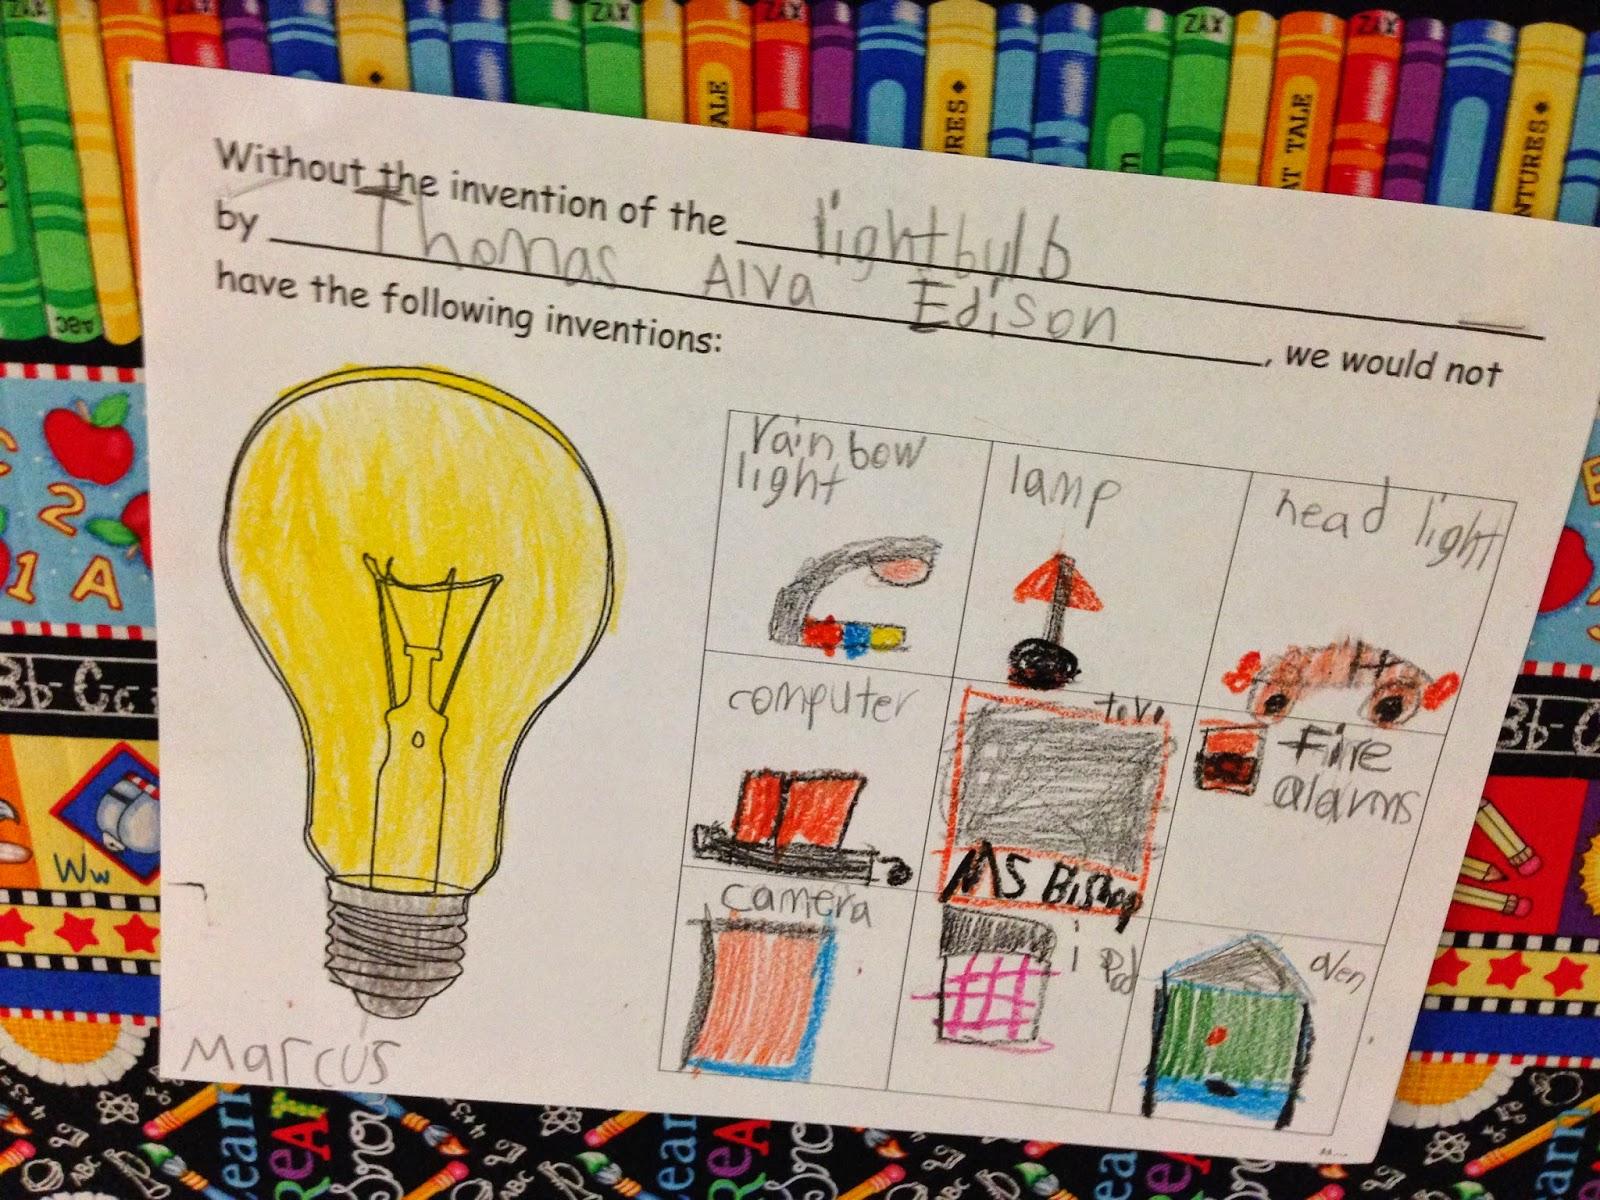 Bishop S Blackboard An Elementary Education Blog Thomas Edison